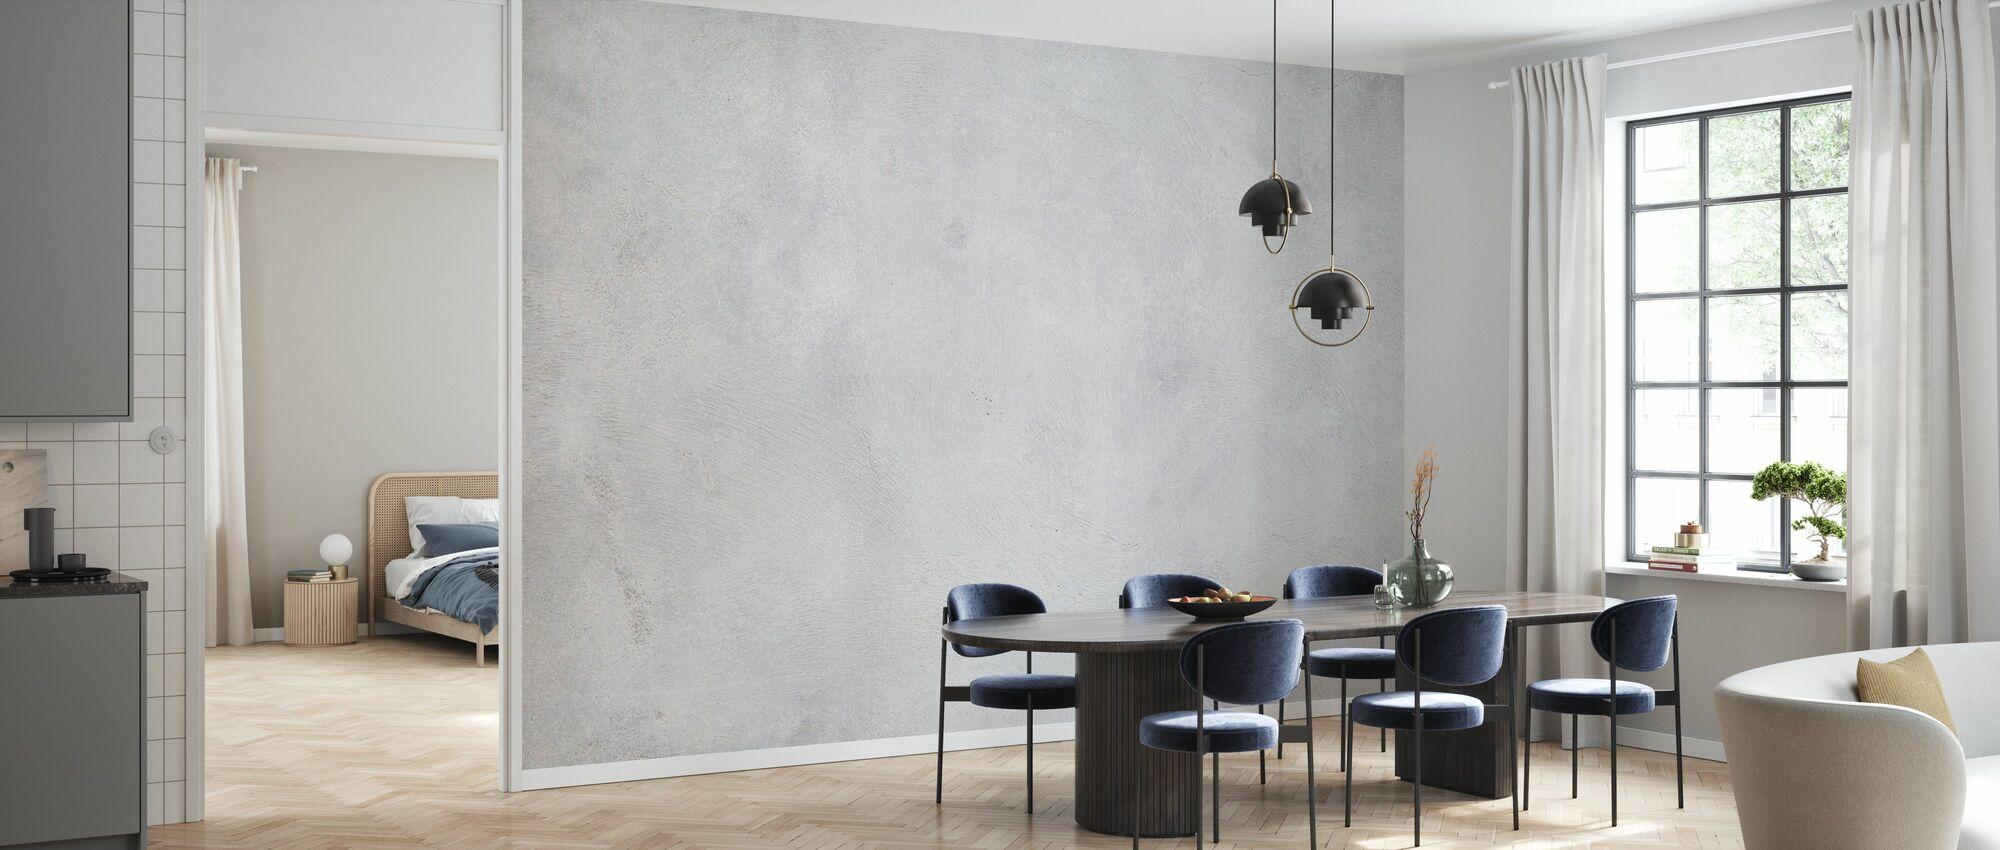 Grunge Concrete Wall - Wallpaper - Kitchen